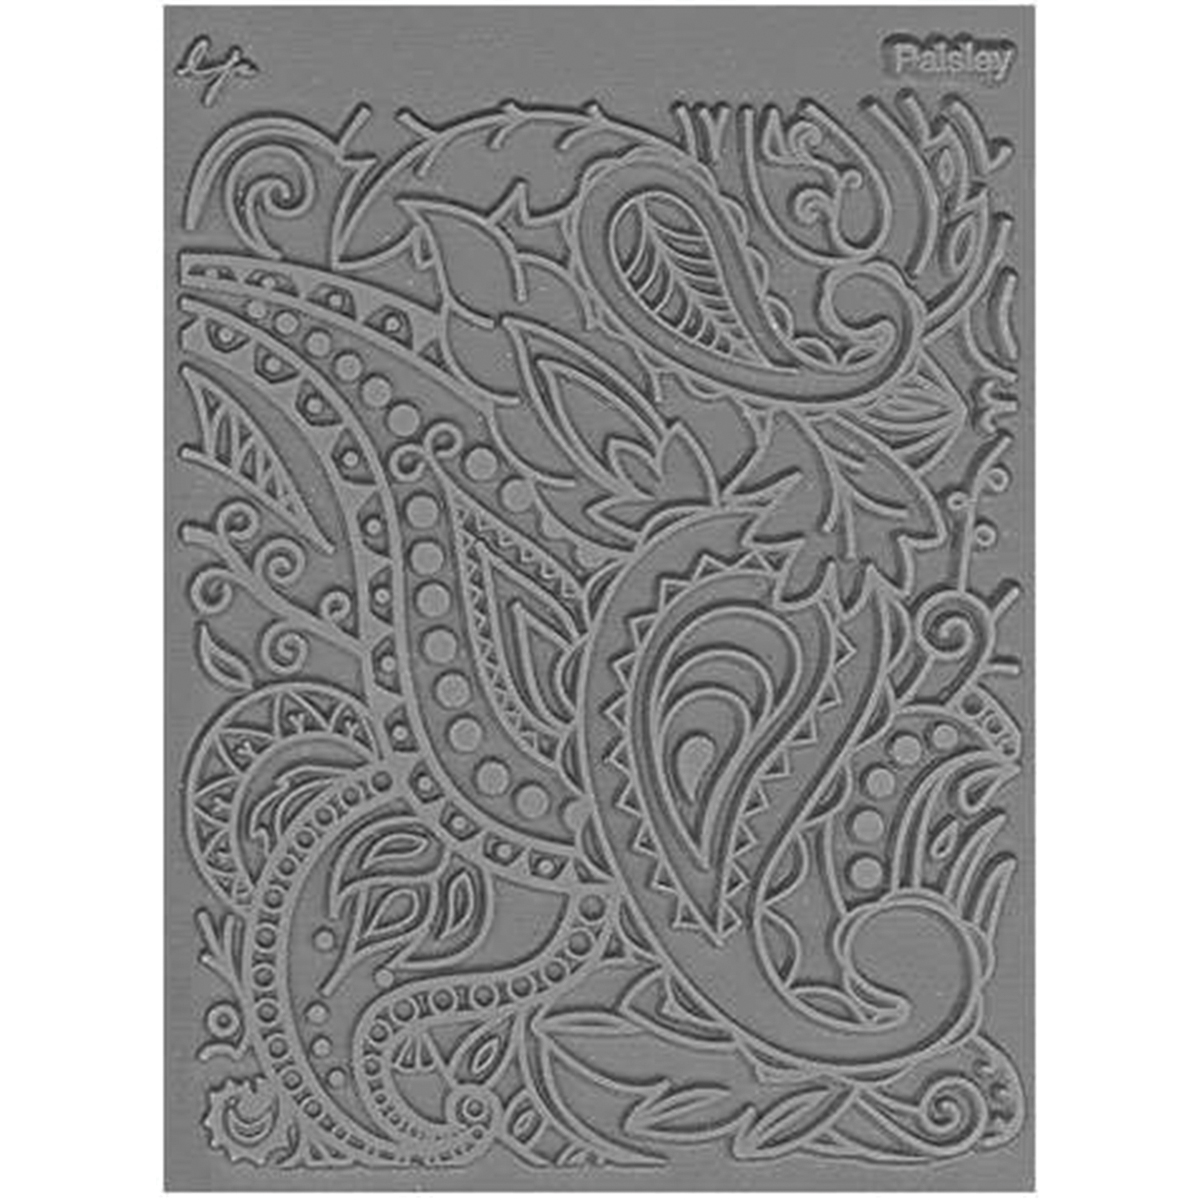 Fossillicious Great Create Christi Friesen Texture Stamp 4.25 x 5.5-inch